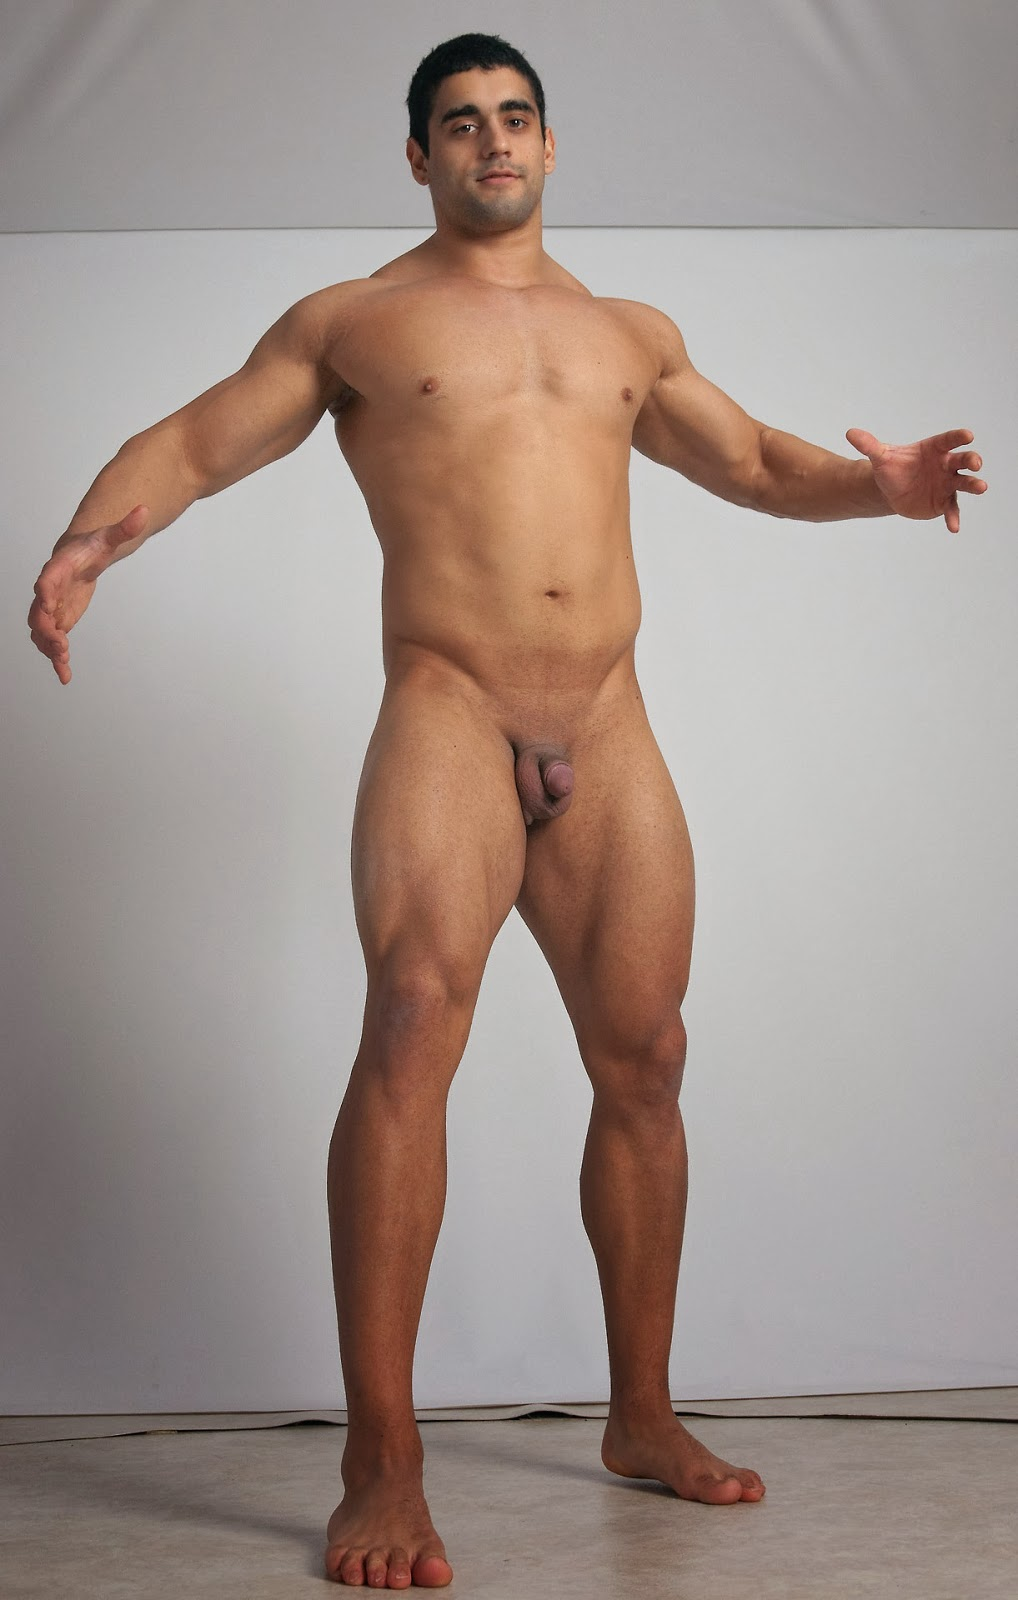 Nude erections women in front in public of